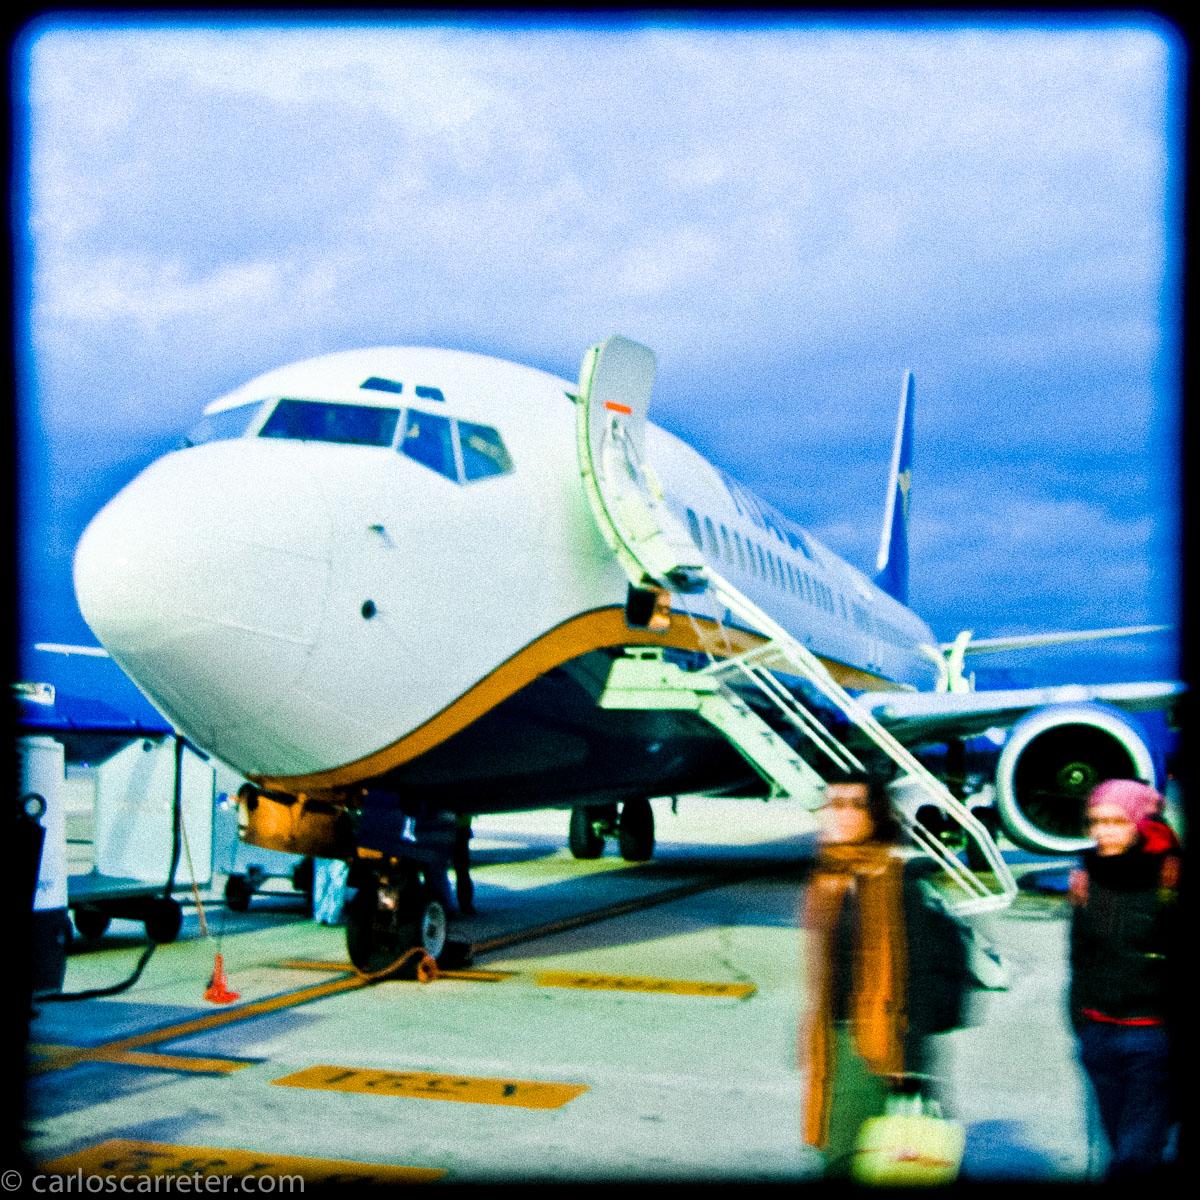 Avión procedente de Roma Ciampino